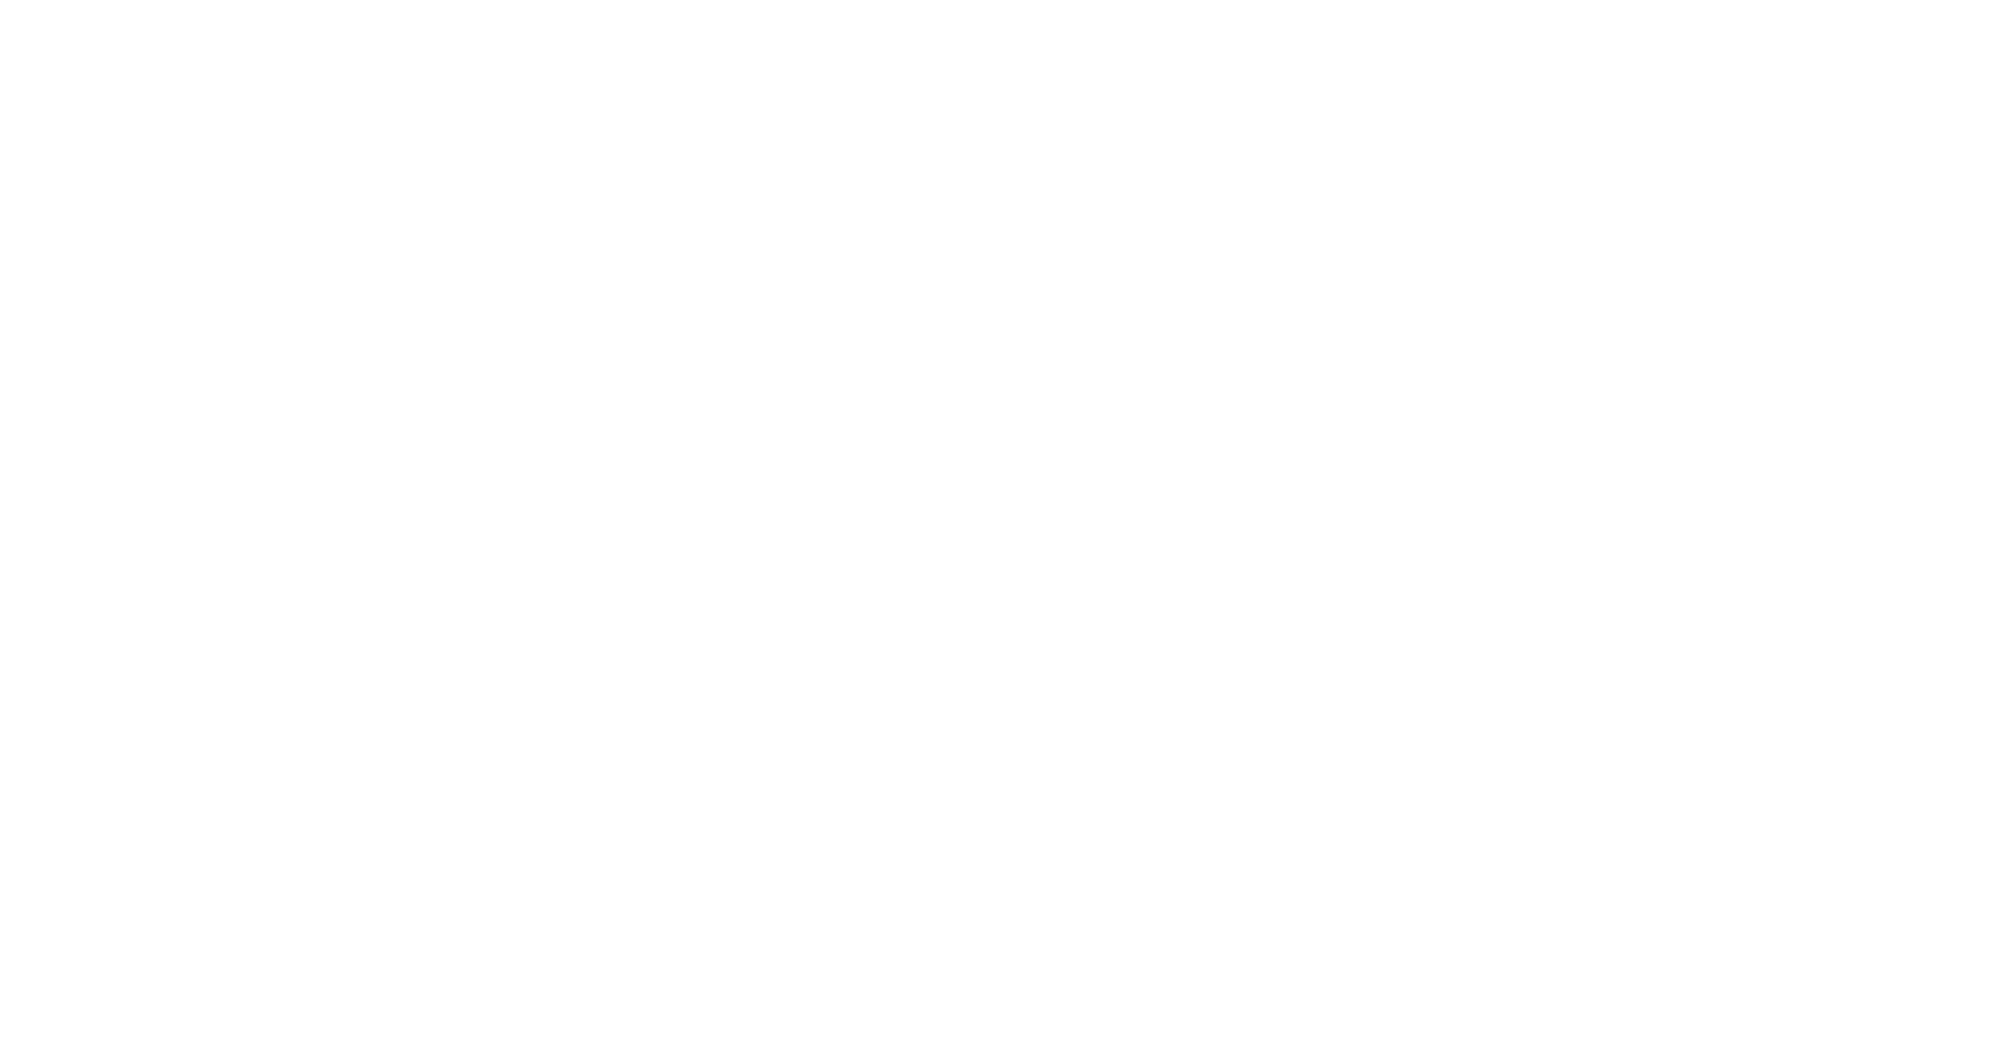 Dominic de Souza